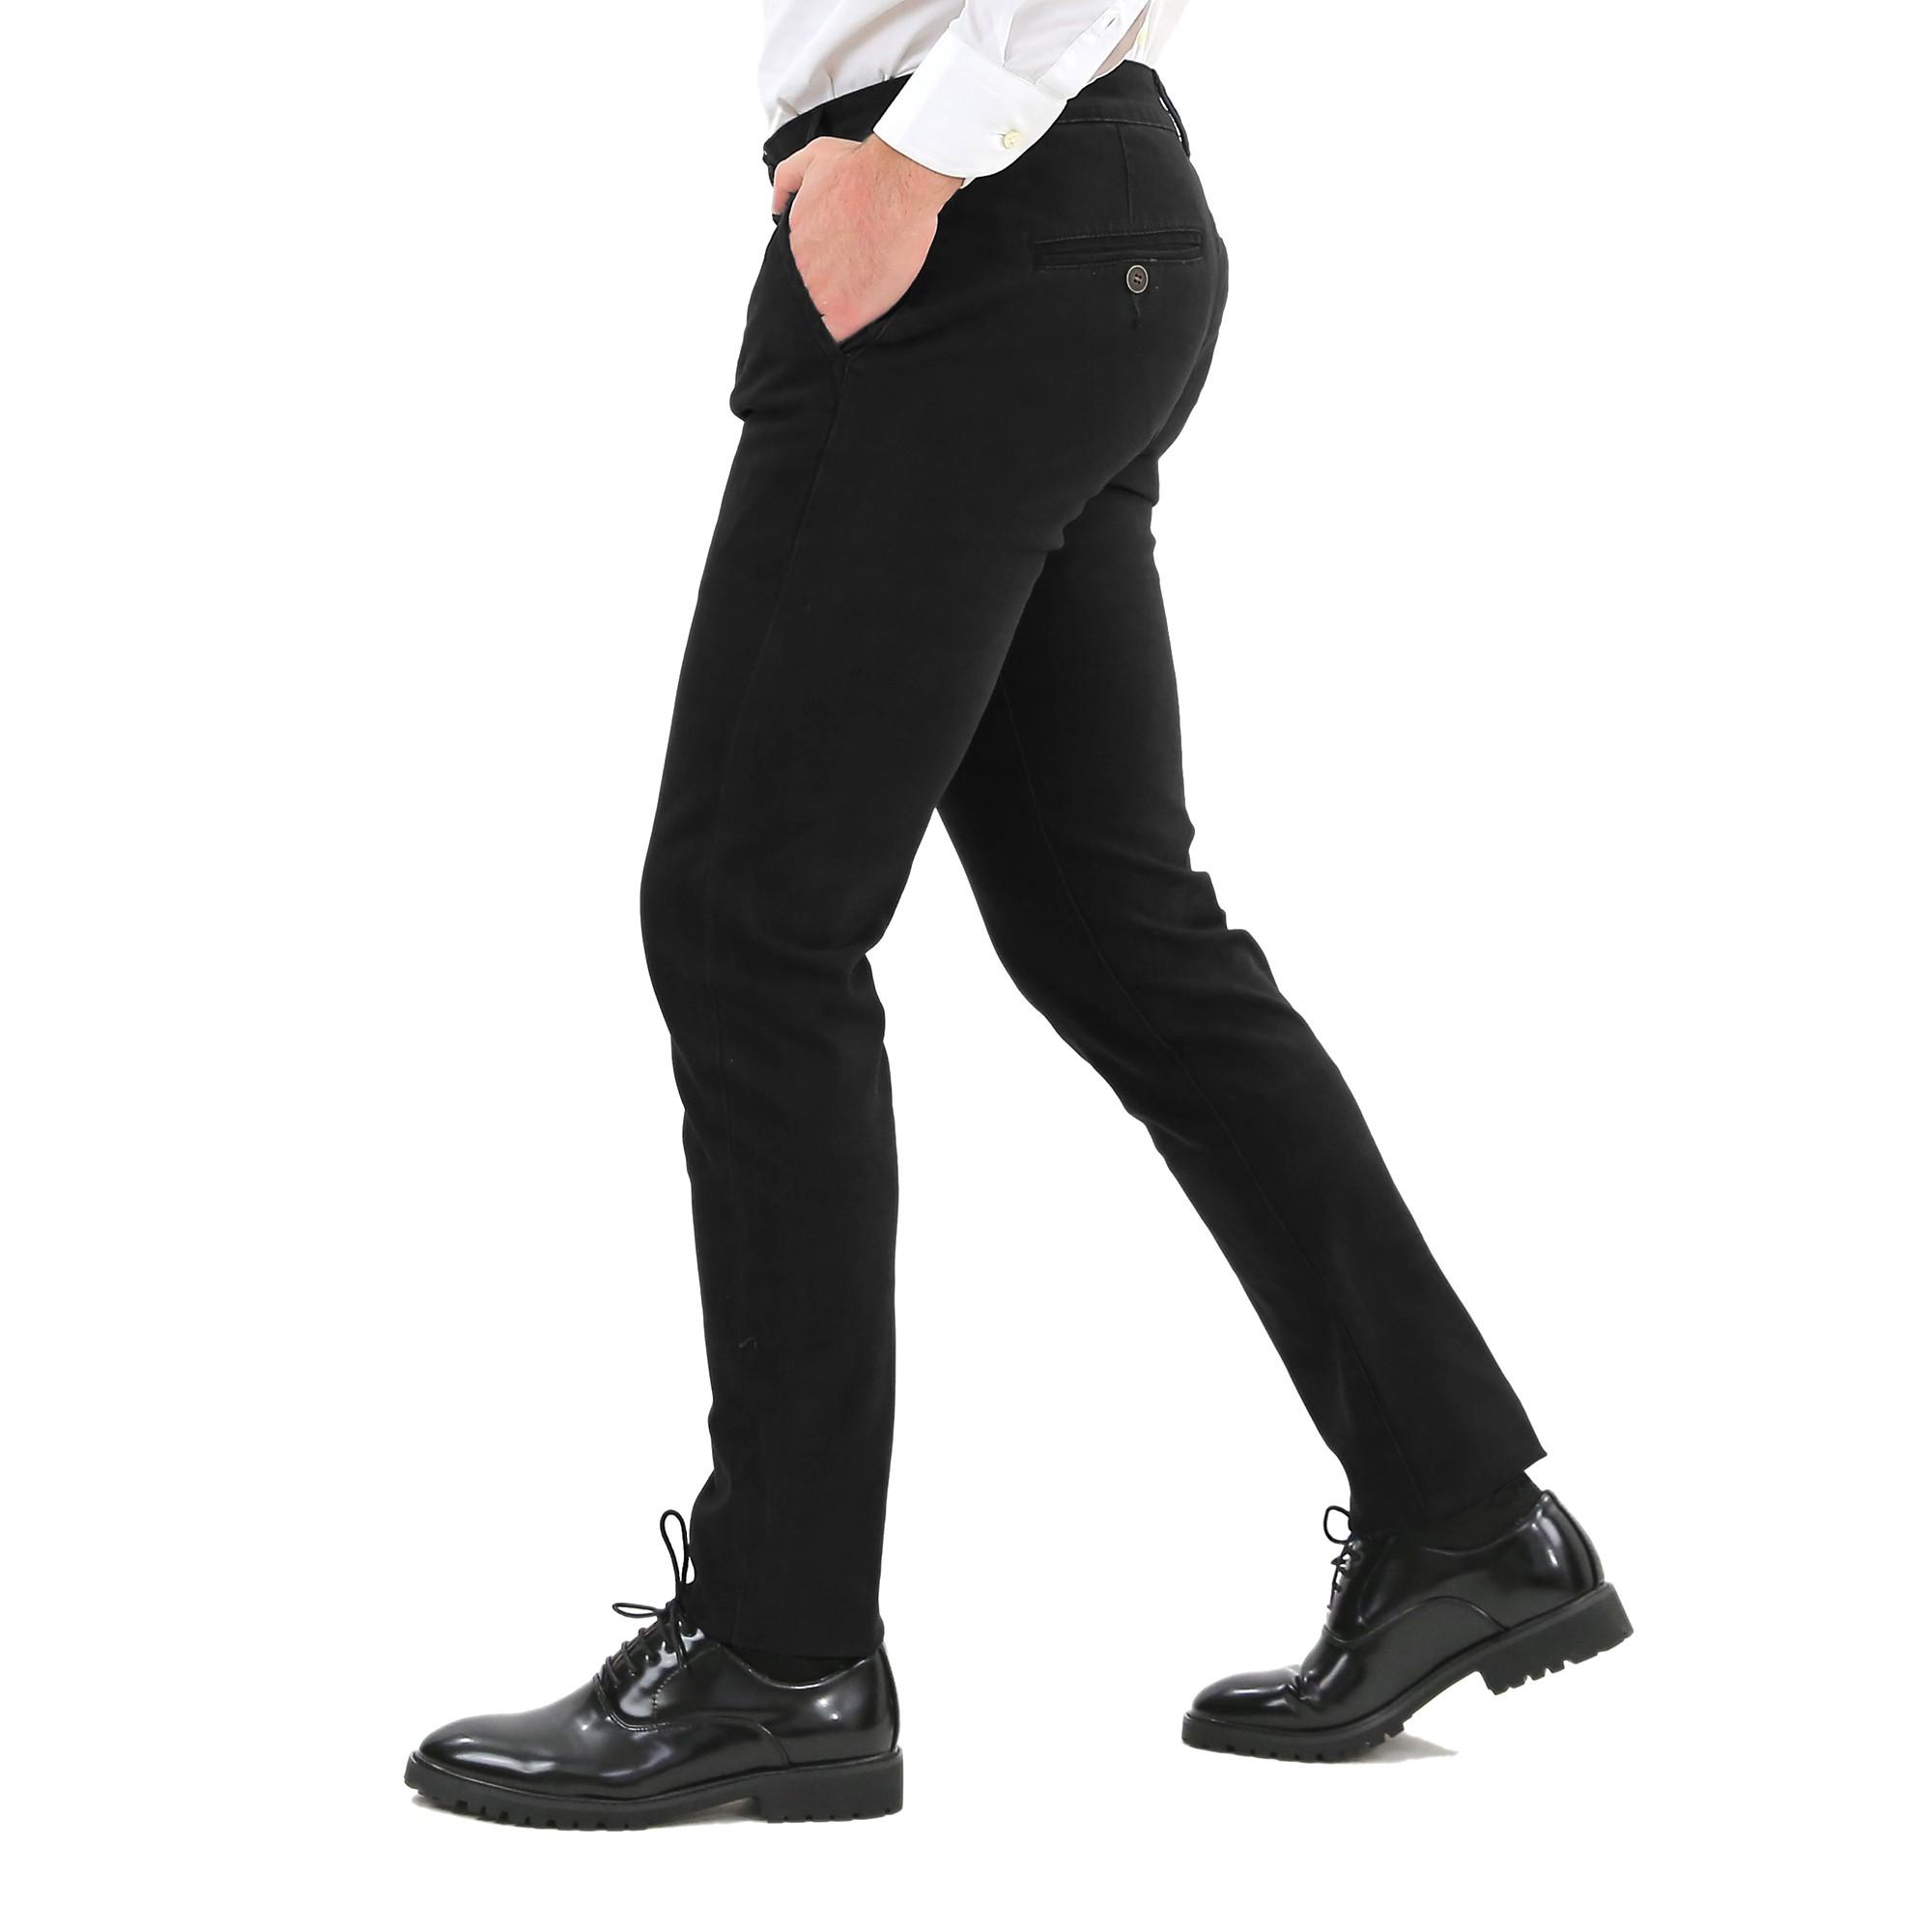 Pantaloni-Uomo-Slim-Fit-Eleganti-Invernali-Cargo-Classico-Chino-Kaki-Tasca-Ameri miniatura 6